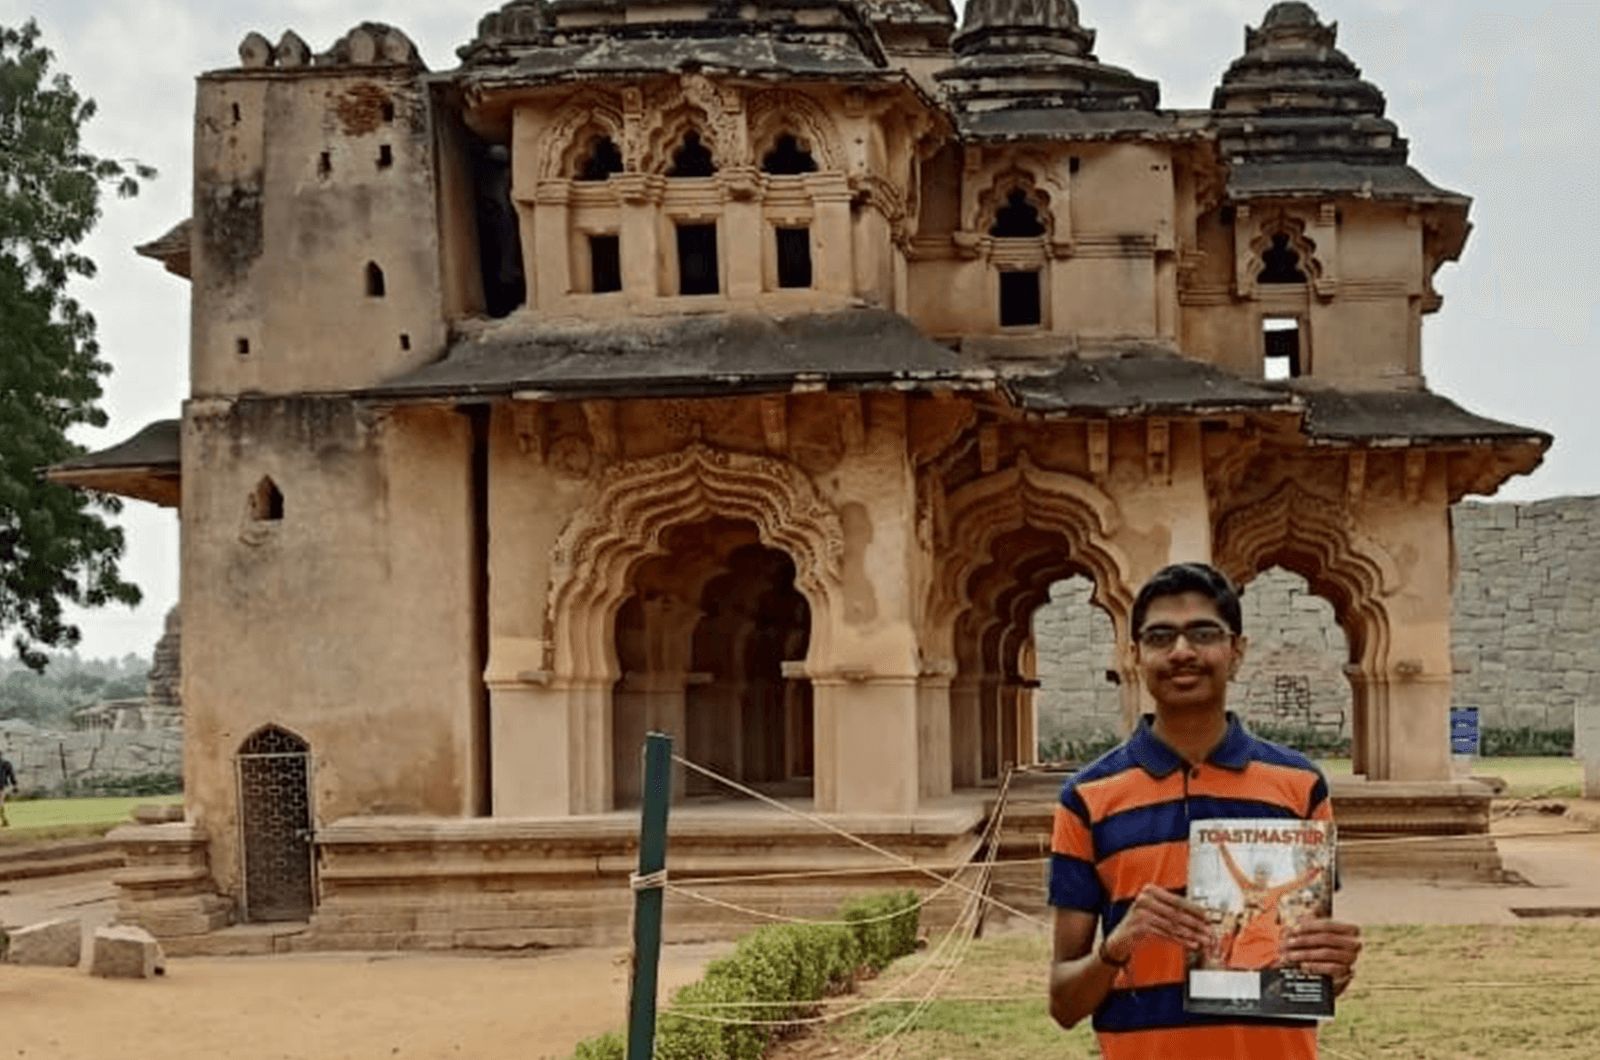 Akash Ravi of Bengaluru, Karnataka, India, visits Hampi, Karnataka, India. In this photo, he stands in front of the Lotus Mahal, where royal families of the Vijayanagara Empire resided.